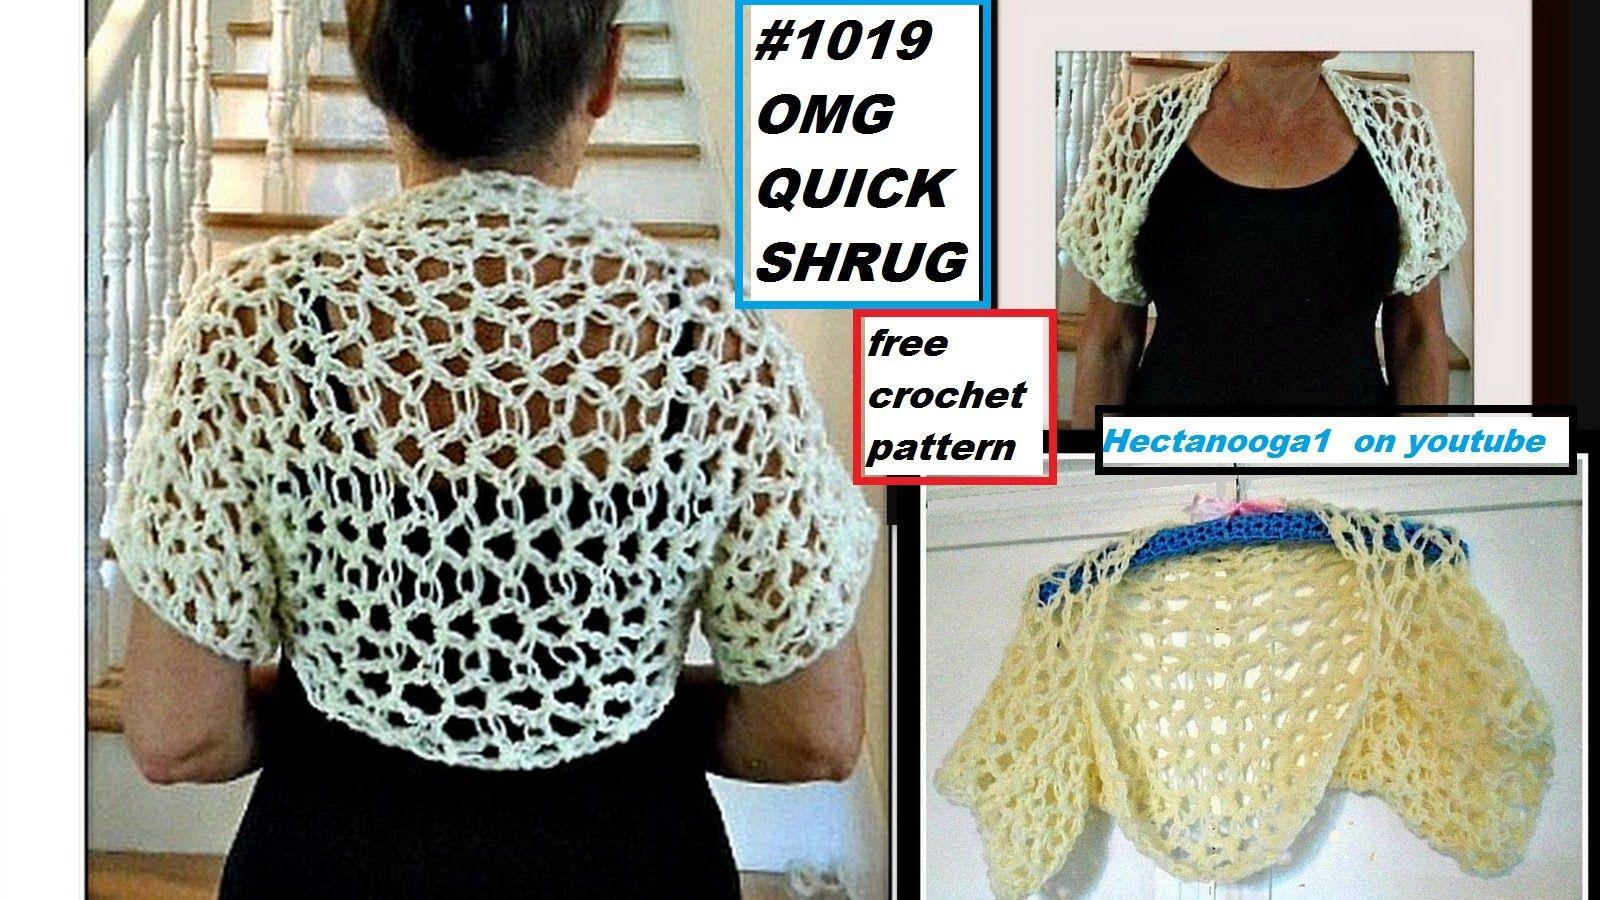 OMG QUICK SHRUG, free crochet pattern tutorial, Pattern#1019. video ...